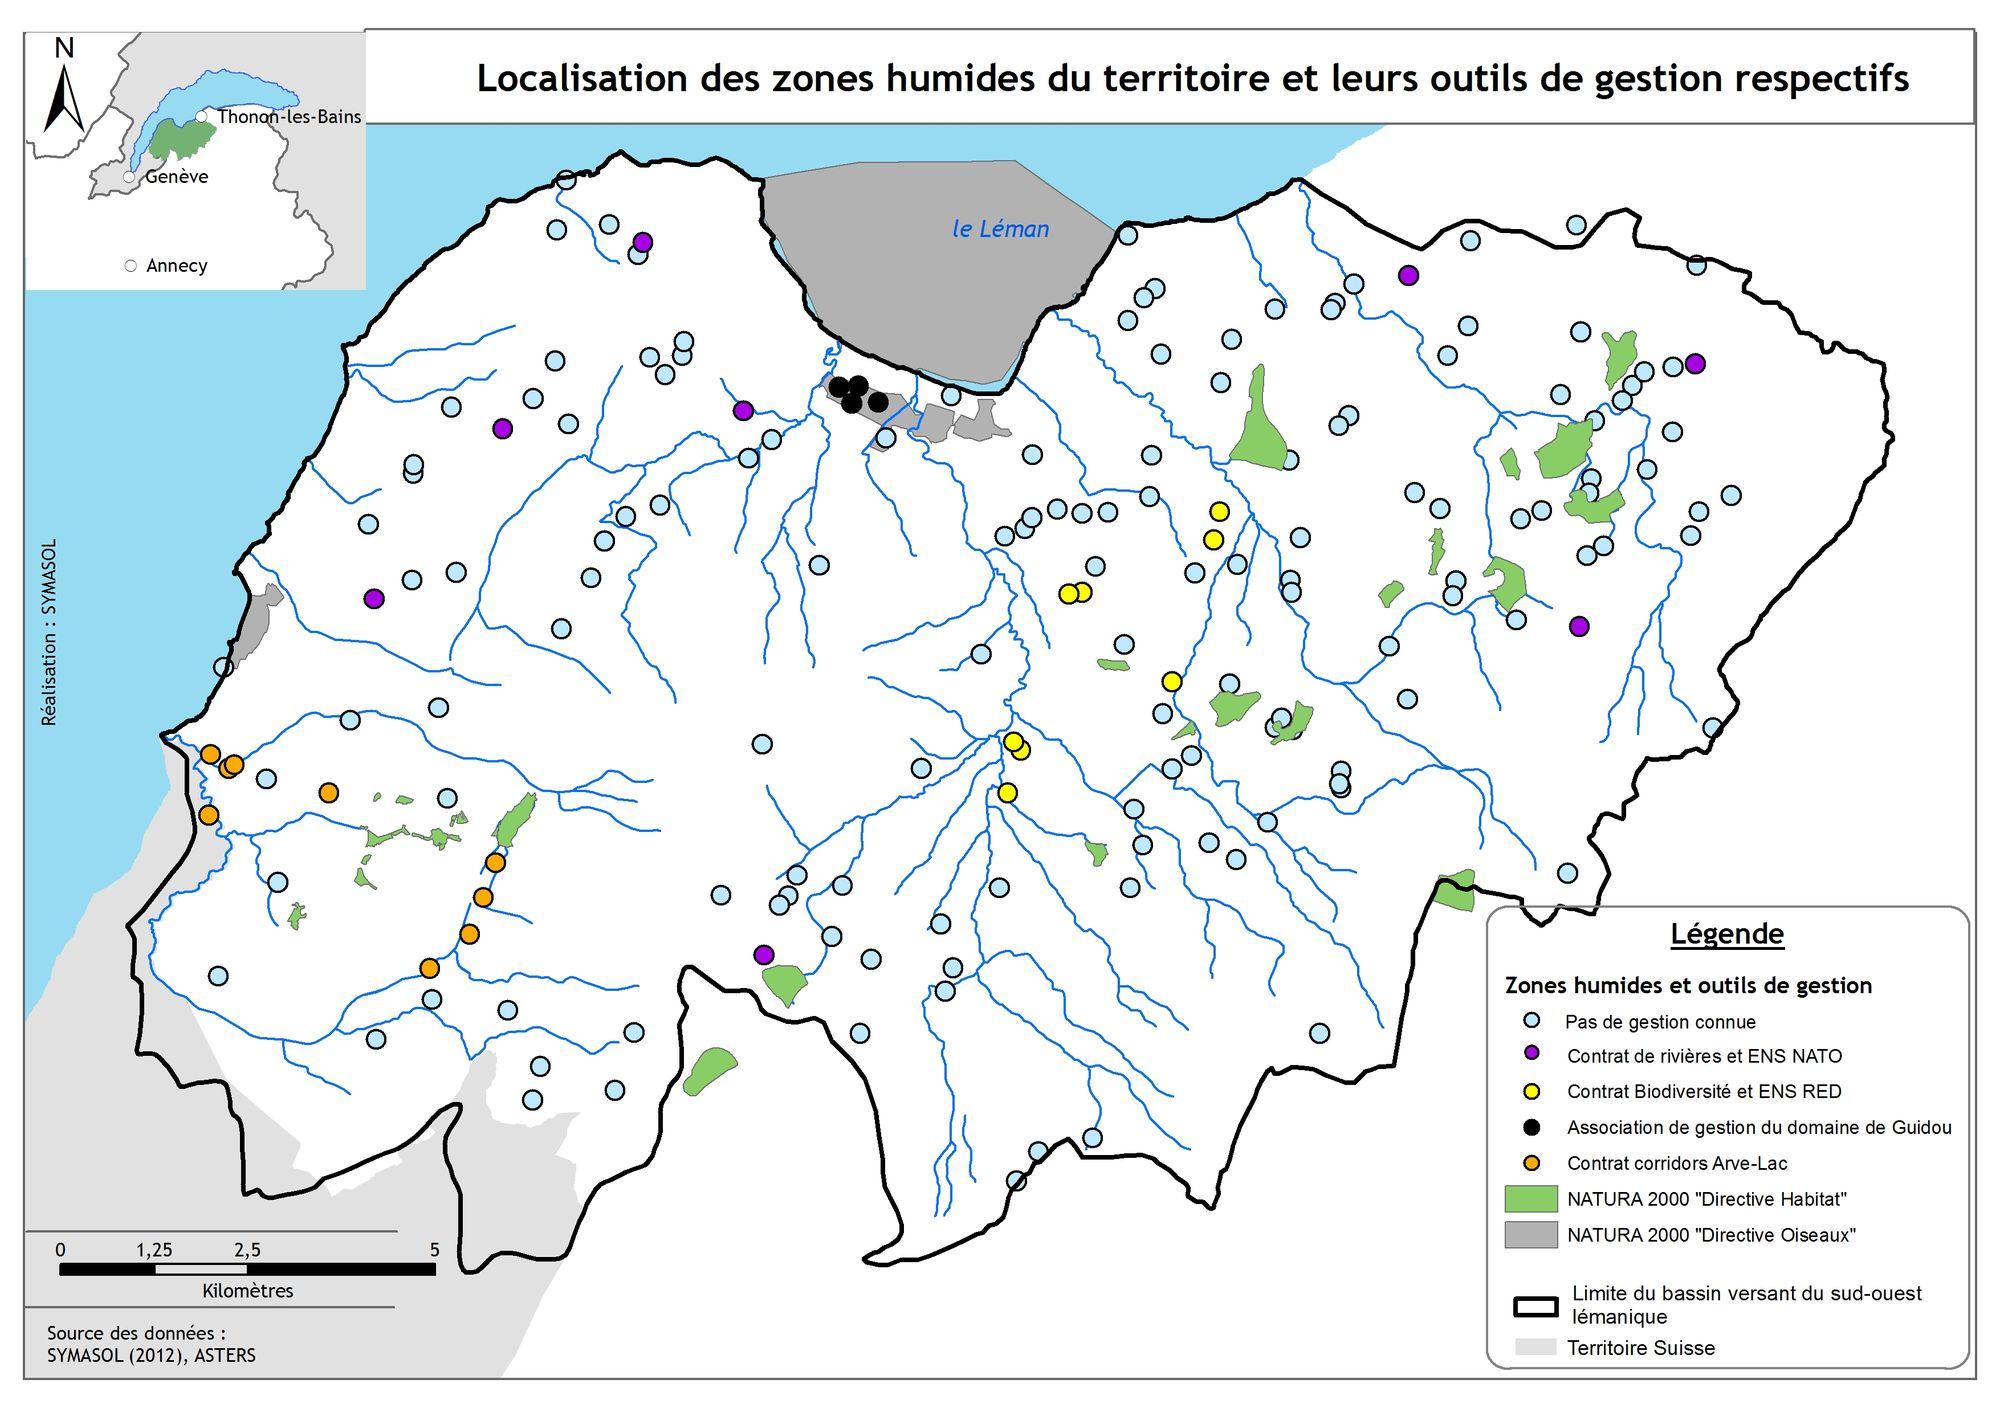 Localisation des zones humides